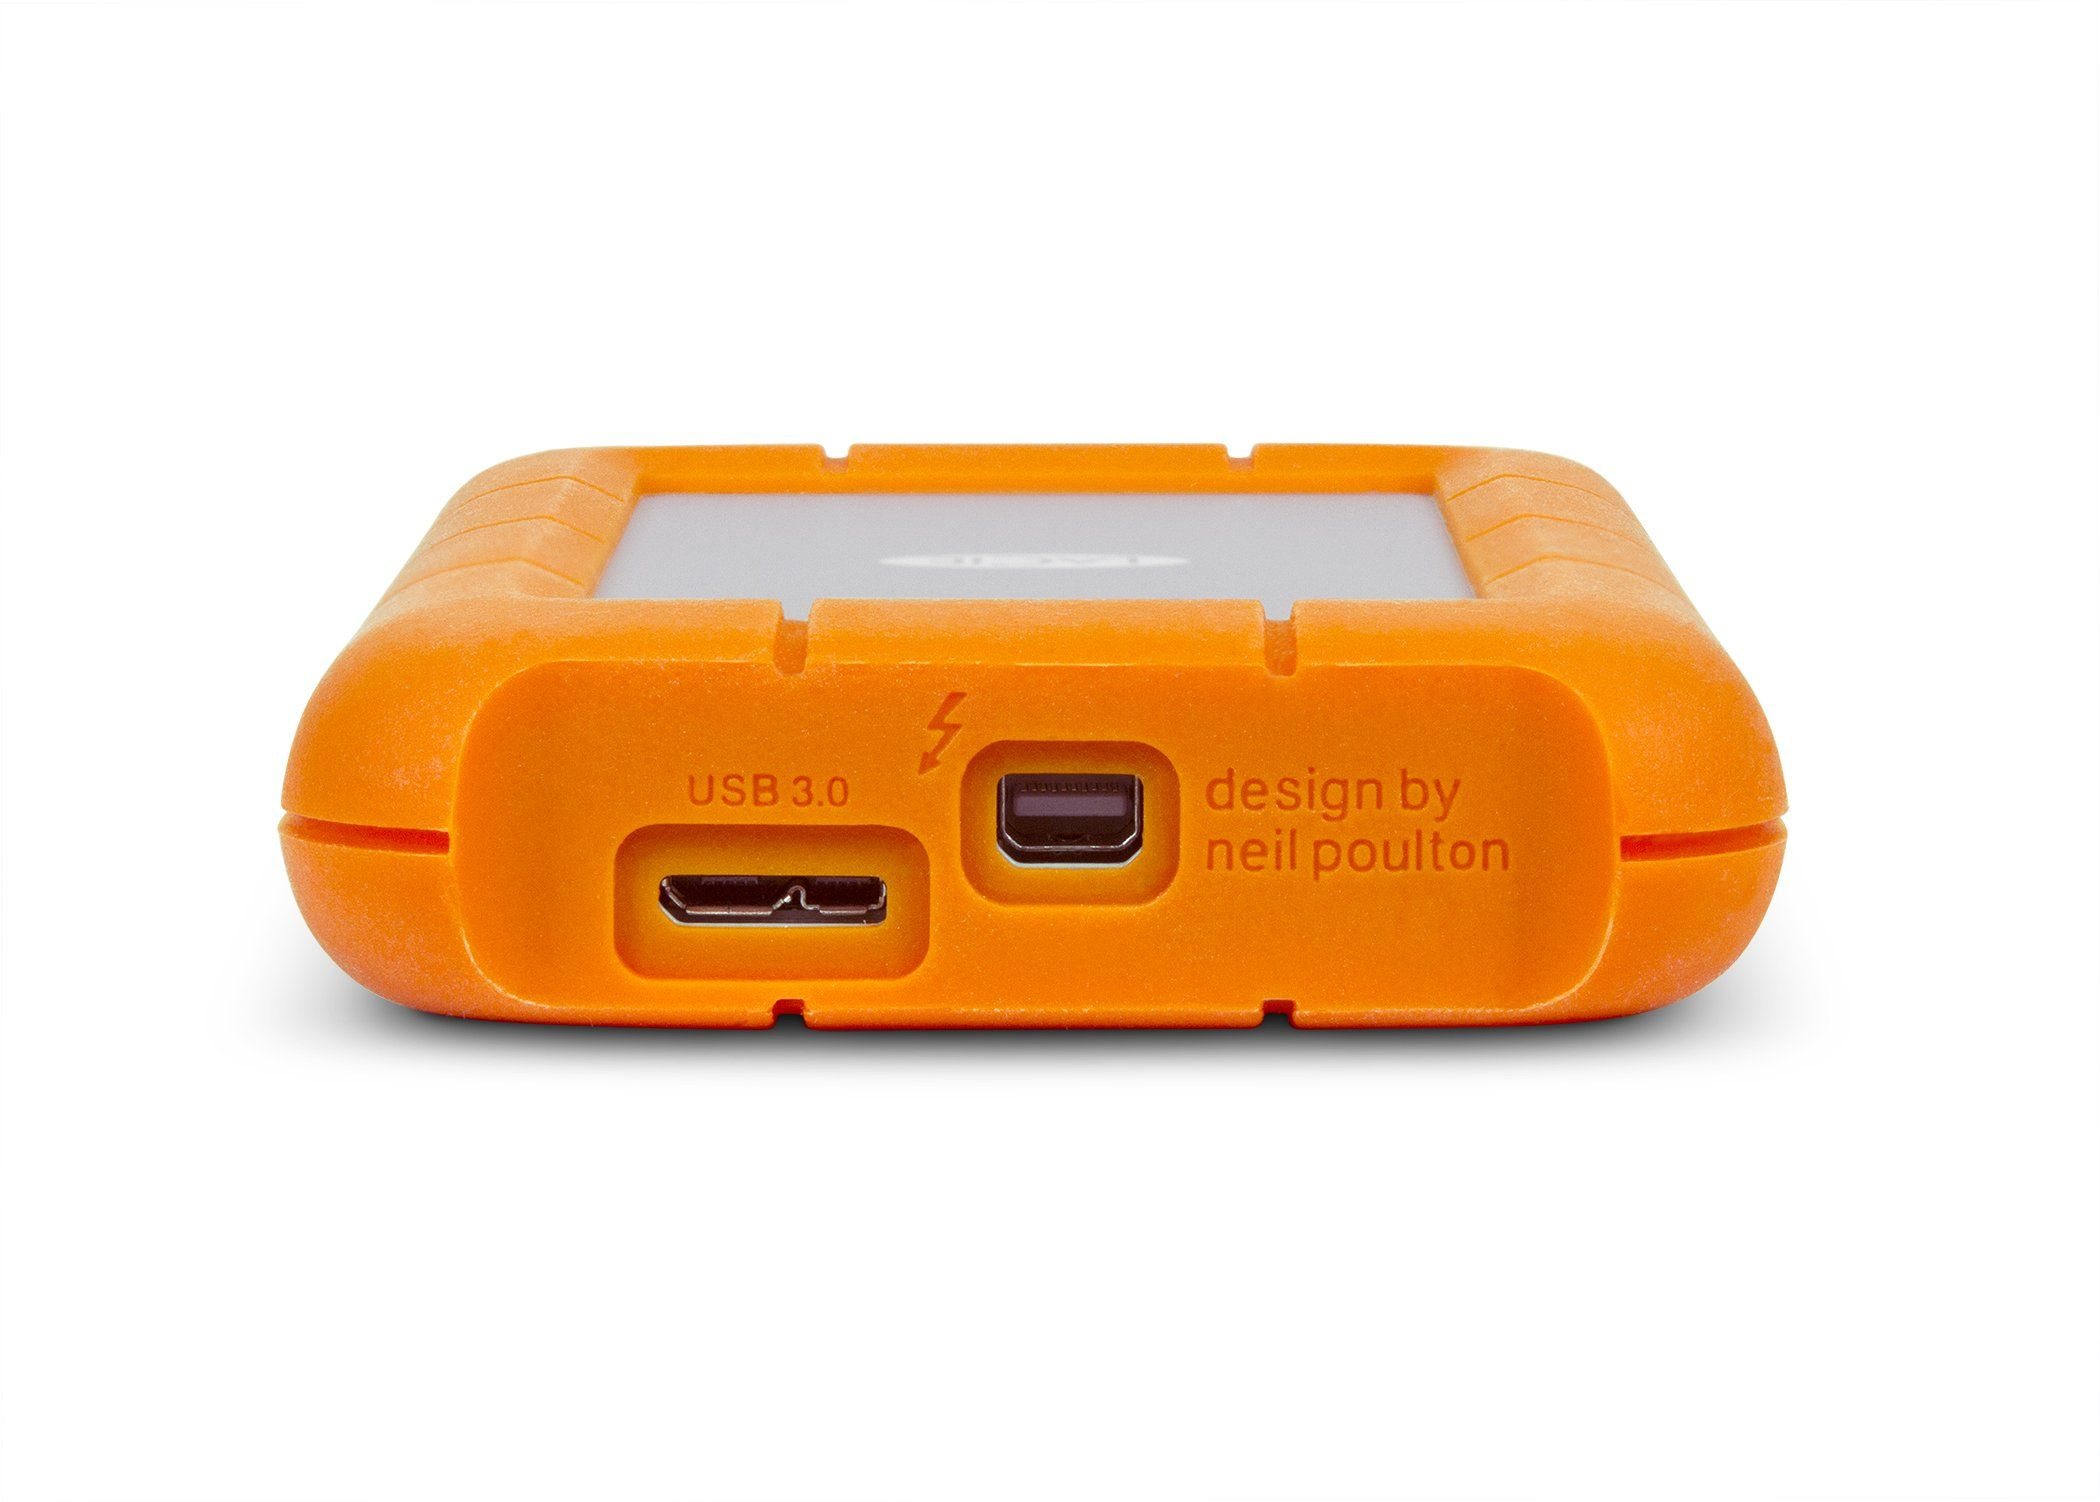 Smile Lacie Rugged Usb 3 0 Thunderbolt Series 1tb External Hard Drive 9000294